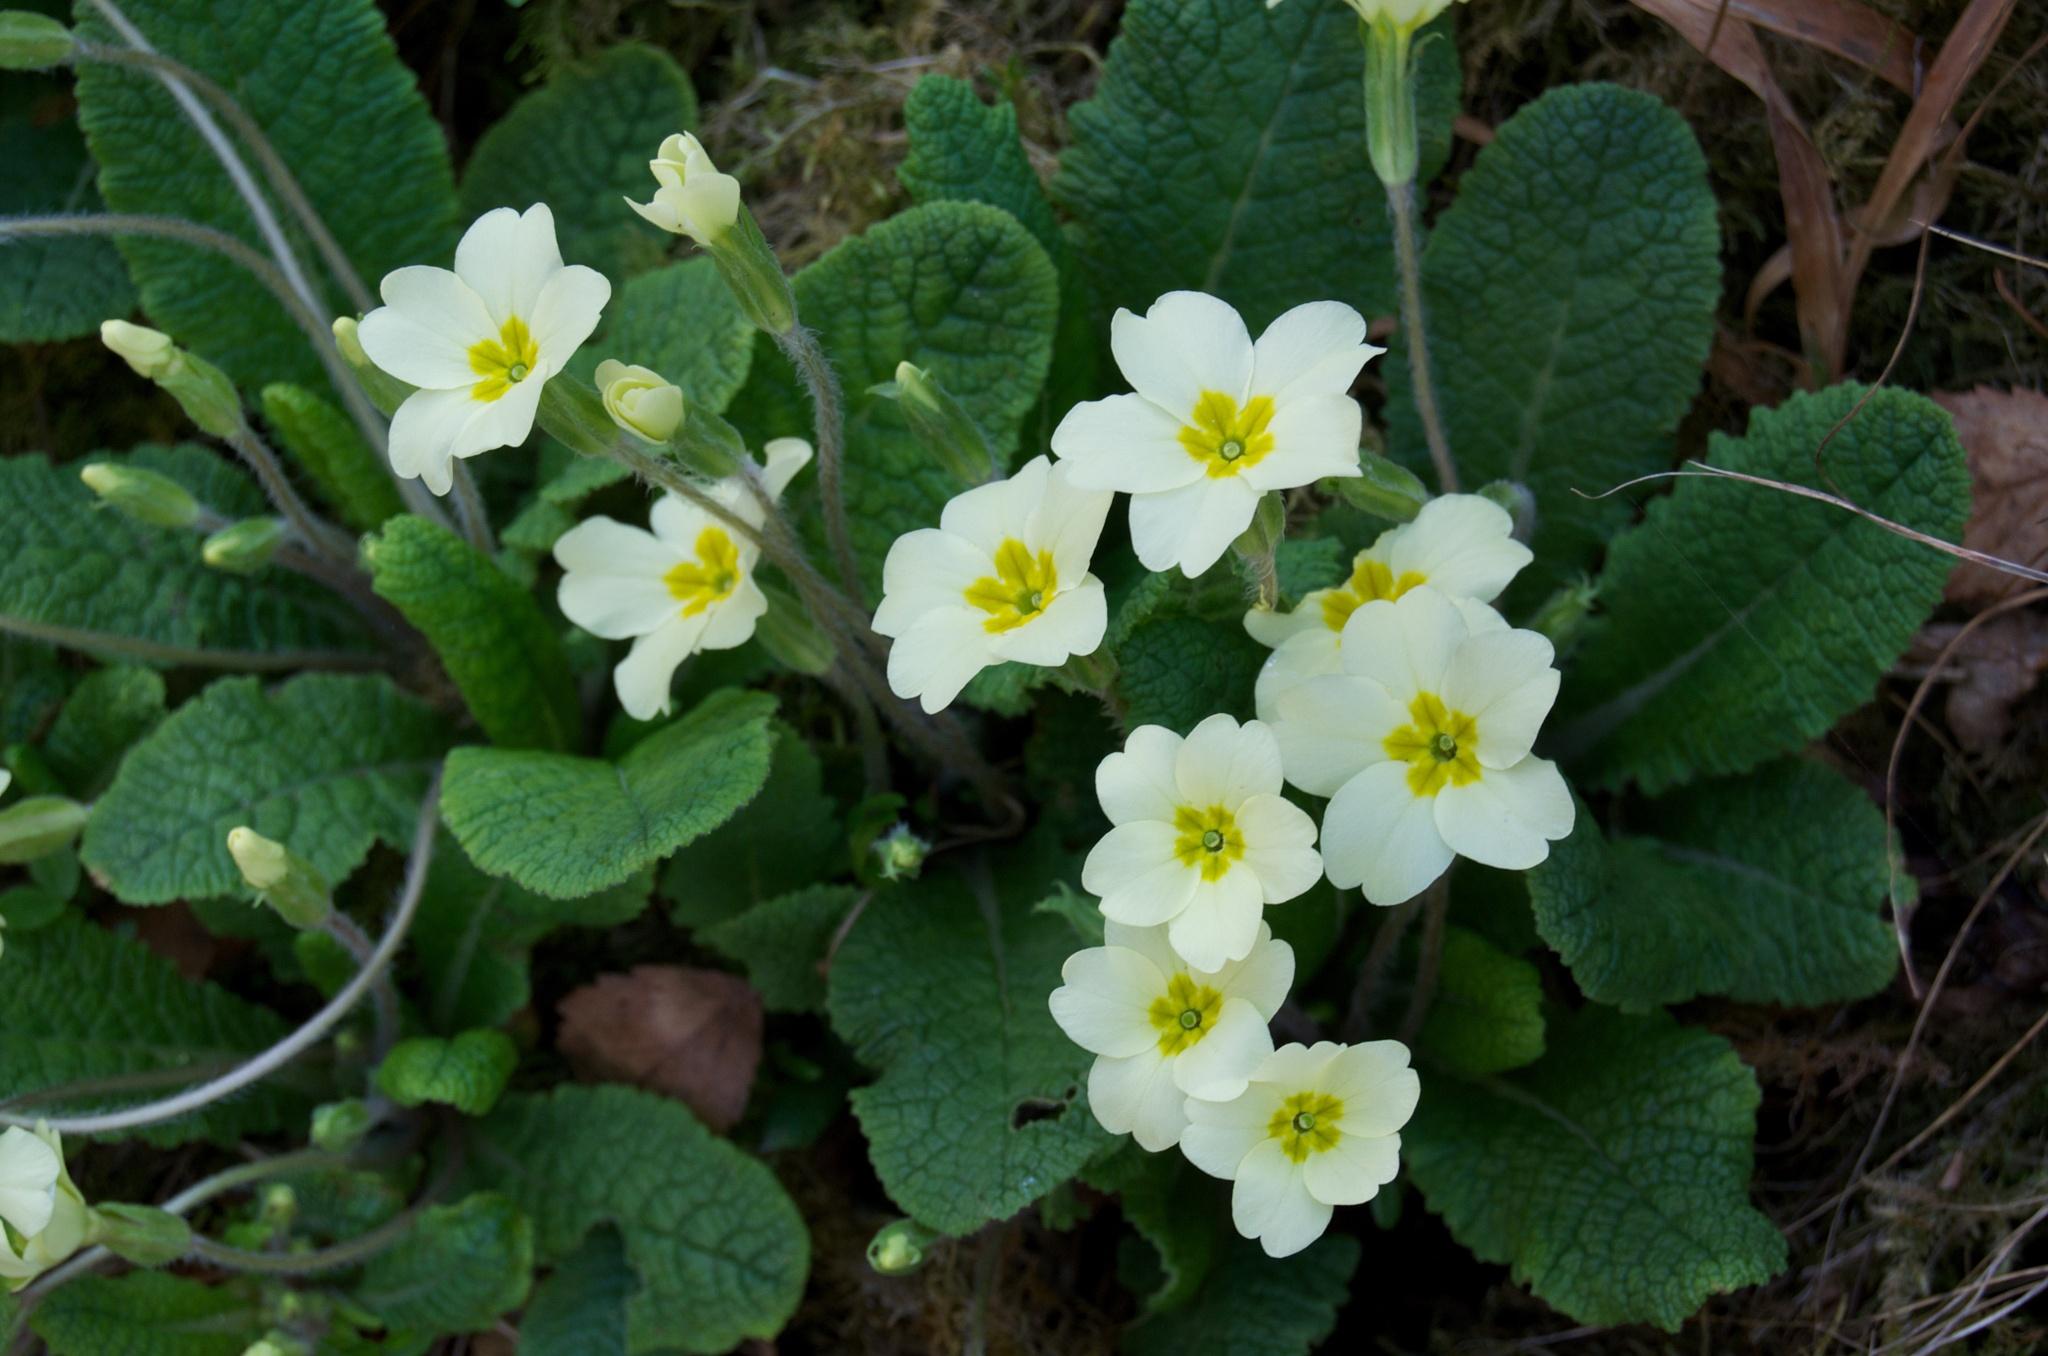 Primrose (Primula vulgaris) by Lars-Toralf Utnes Storstrand